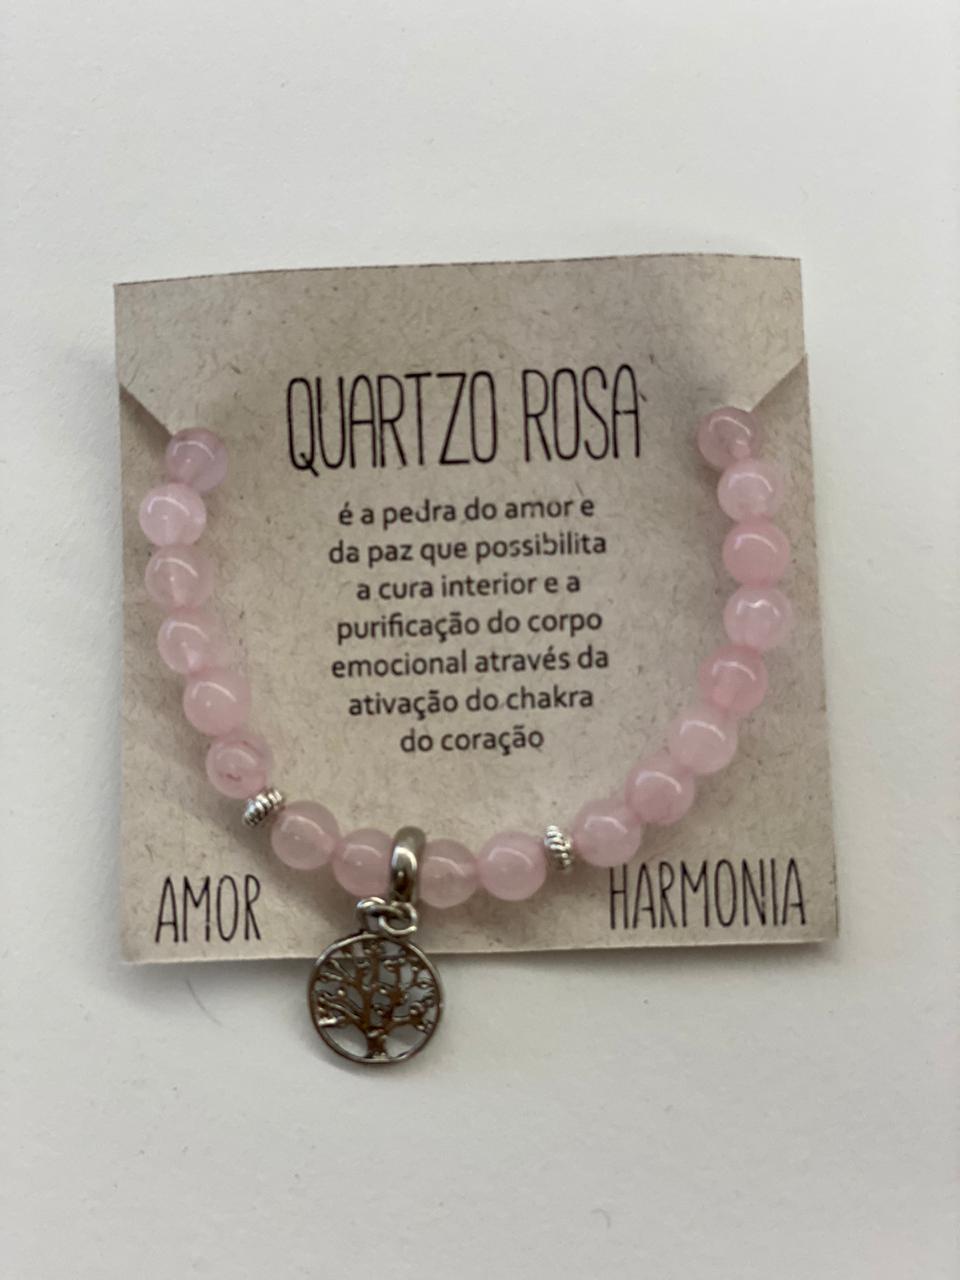 Pulseira Quartzo Rosa - Amor e Harmonia